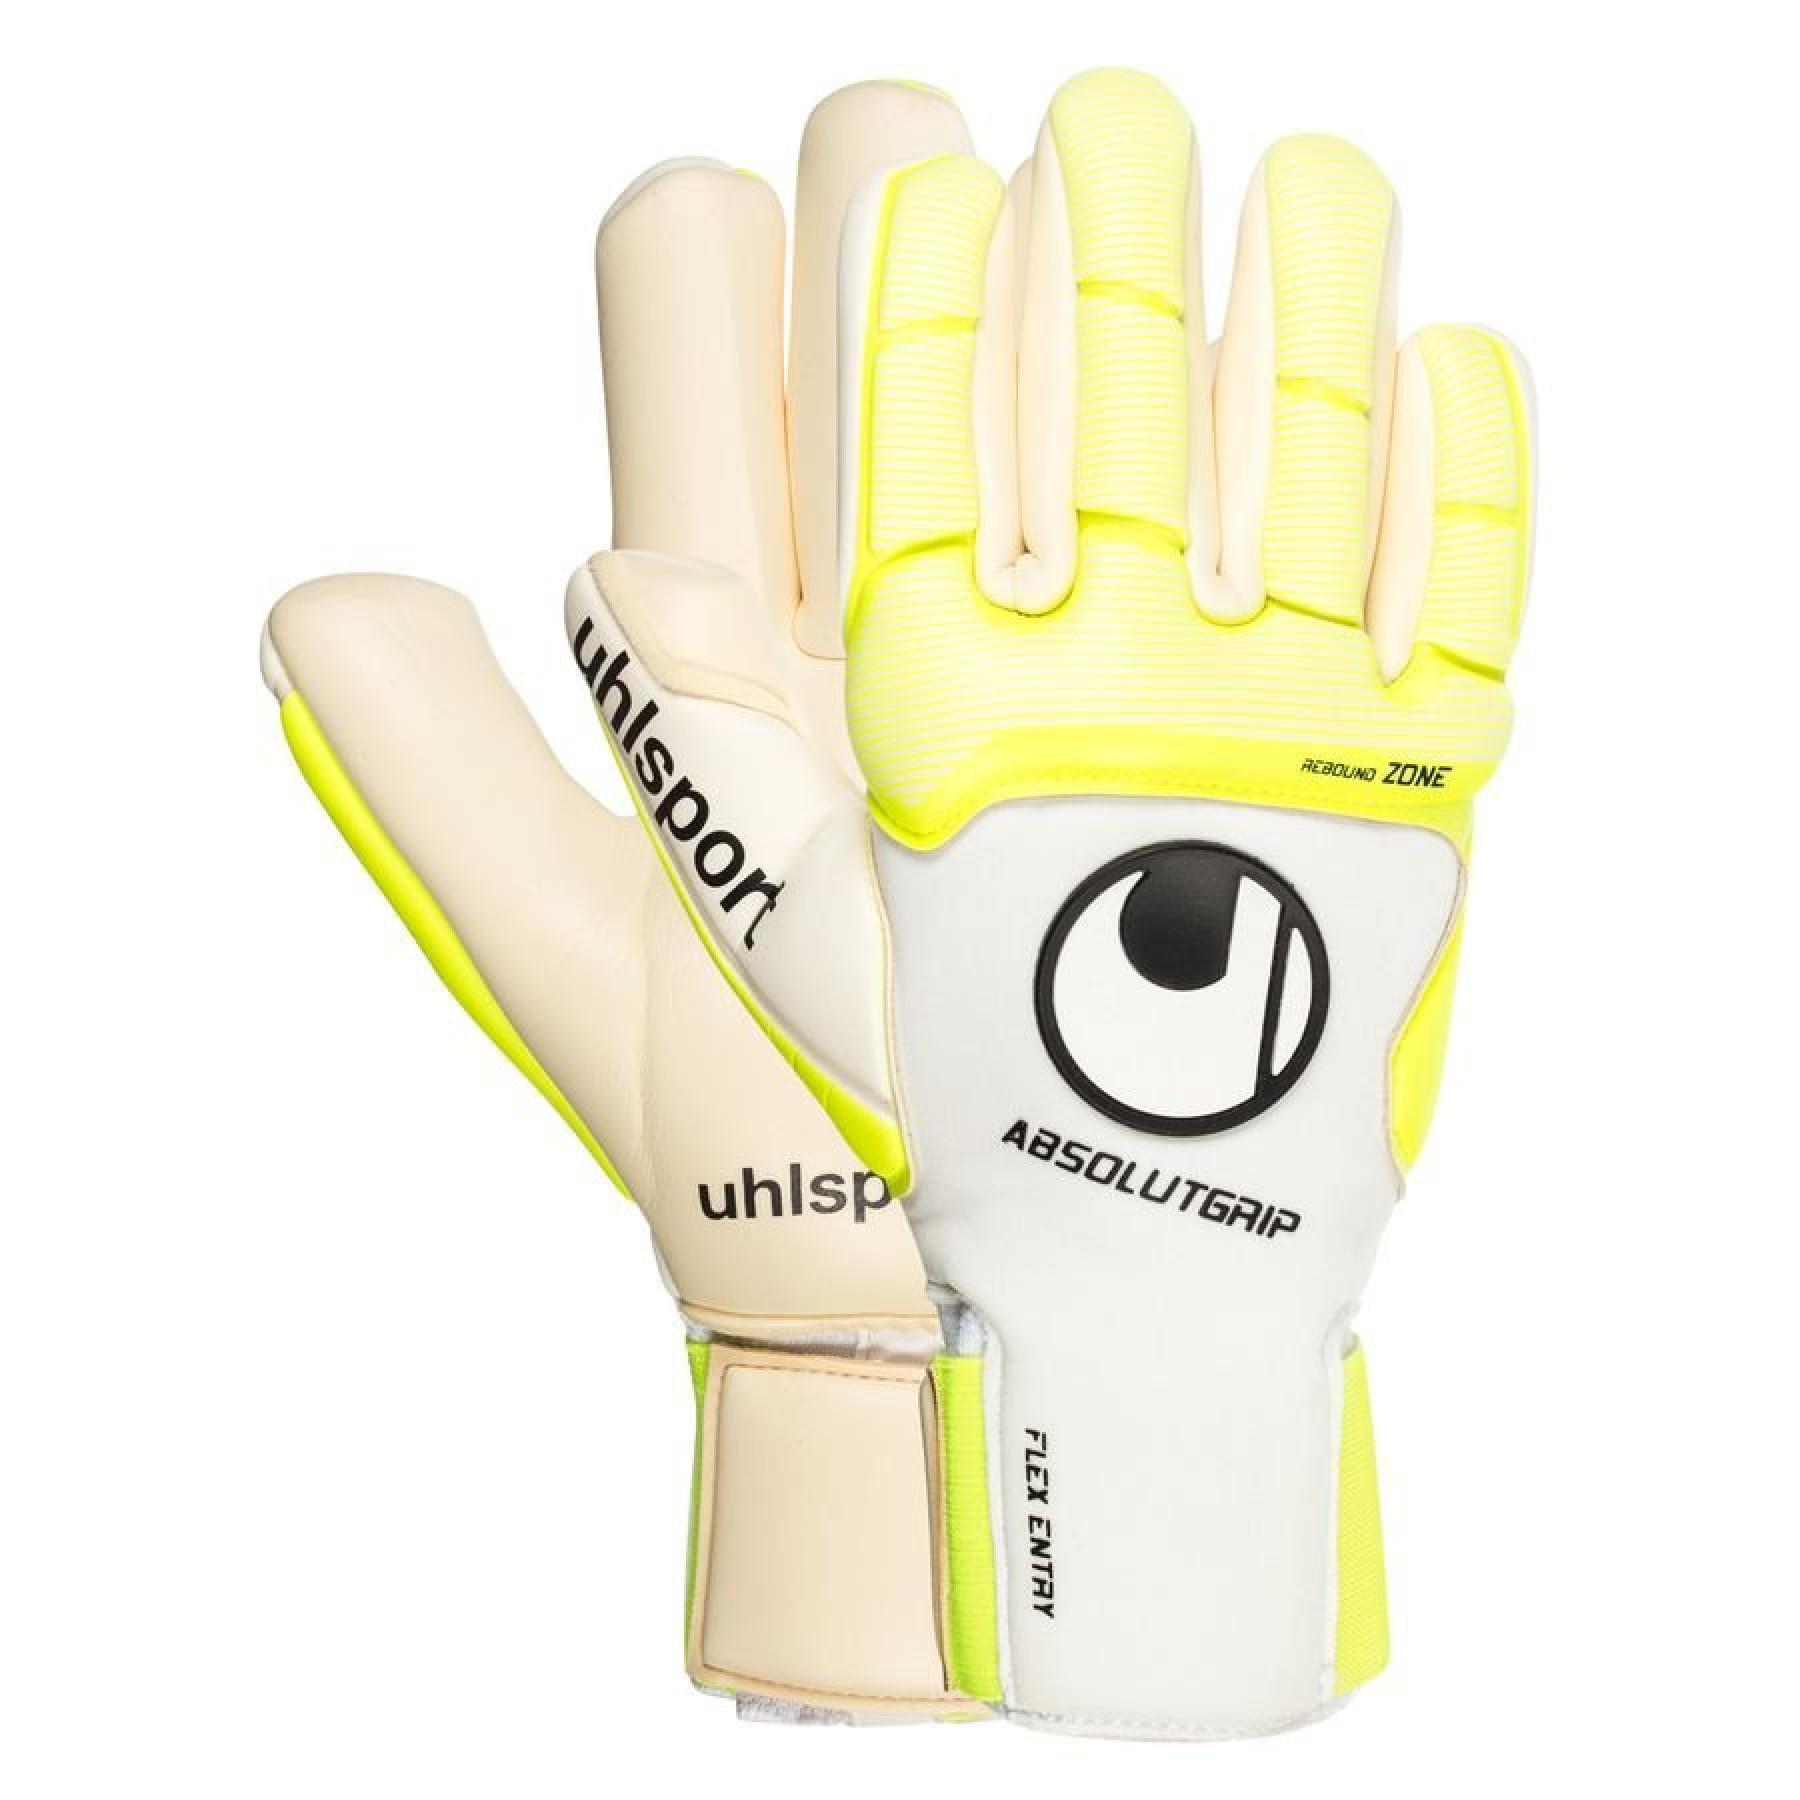 Goalkeeper gloves Uhlsport Pure Alliance AbsolutGrip Finger Surround